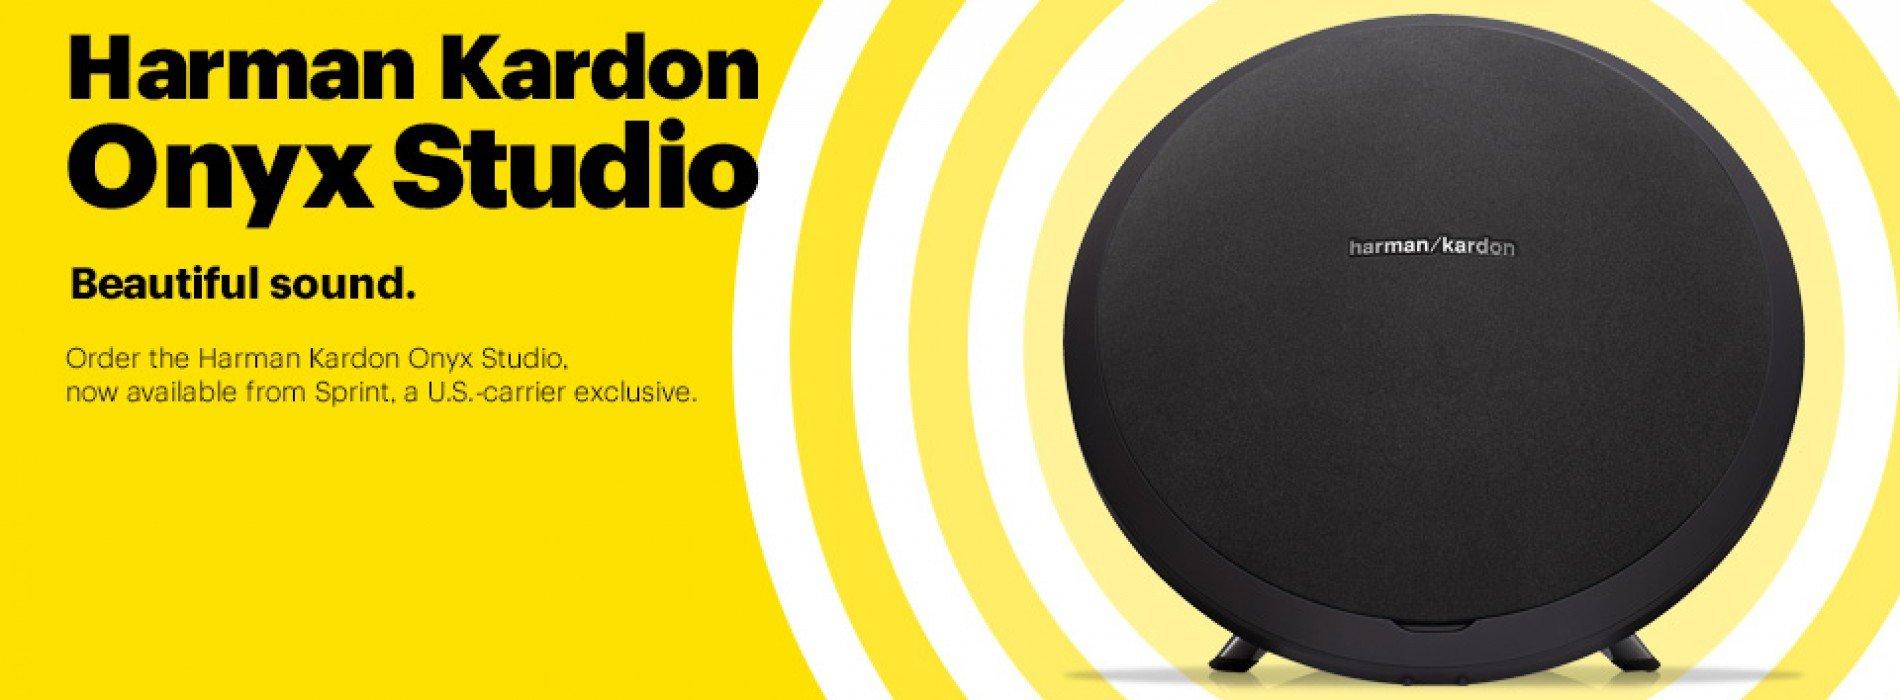 Sprint gets into high end audio game with Harman Kardon